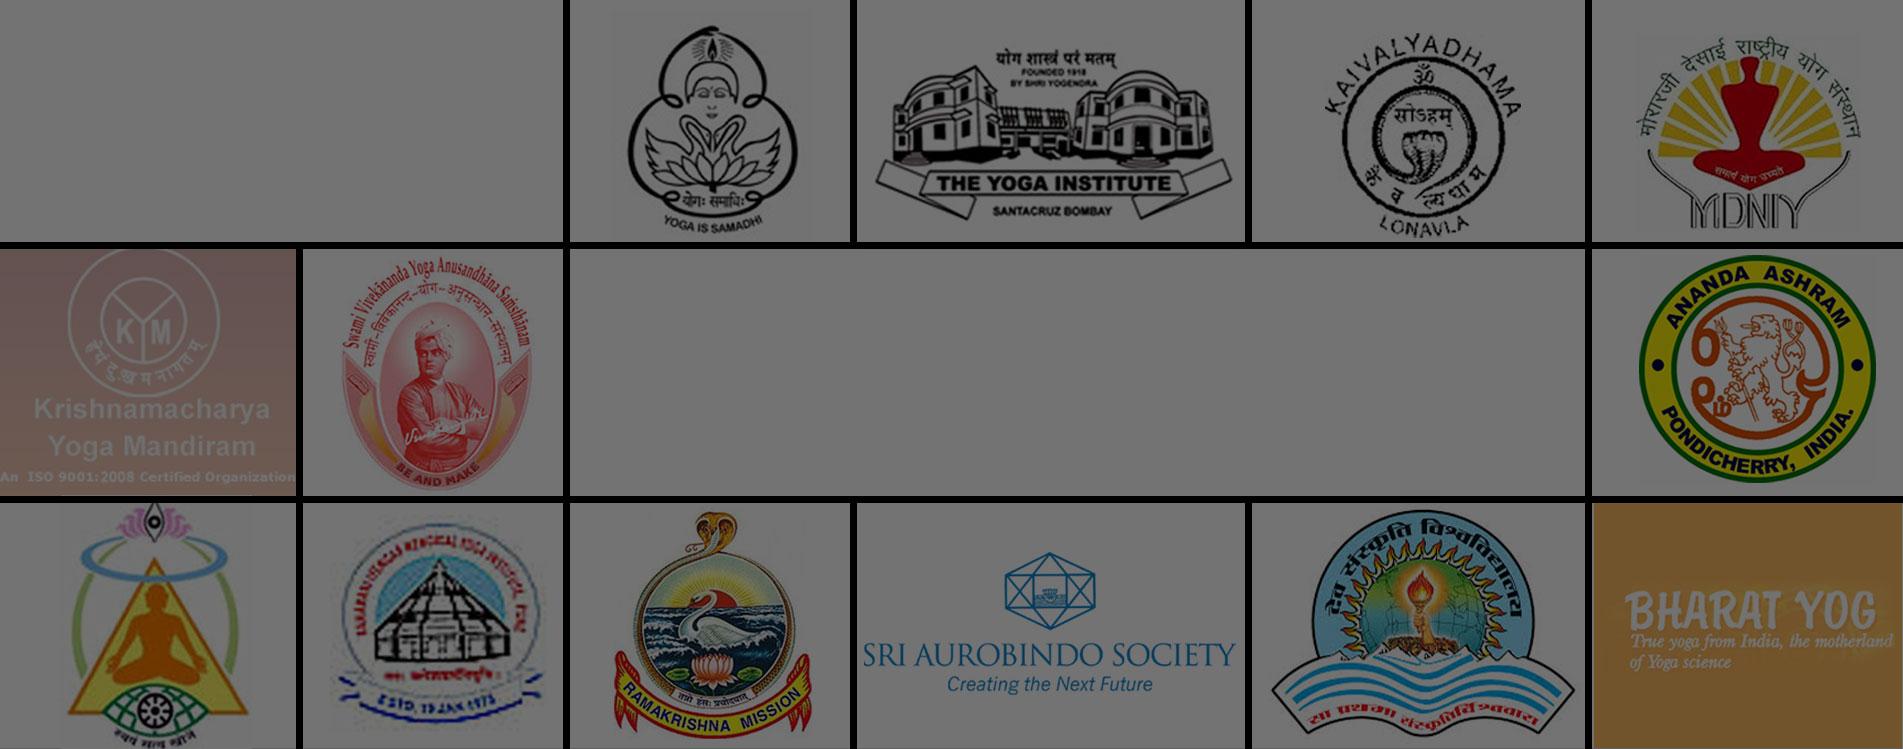 Members-Institutions